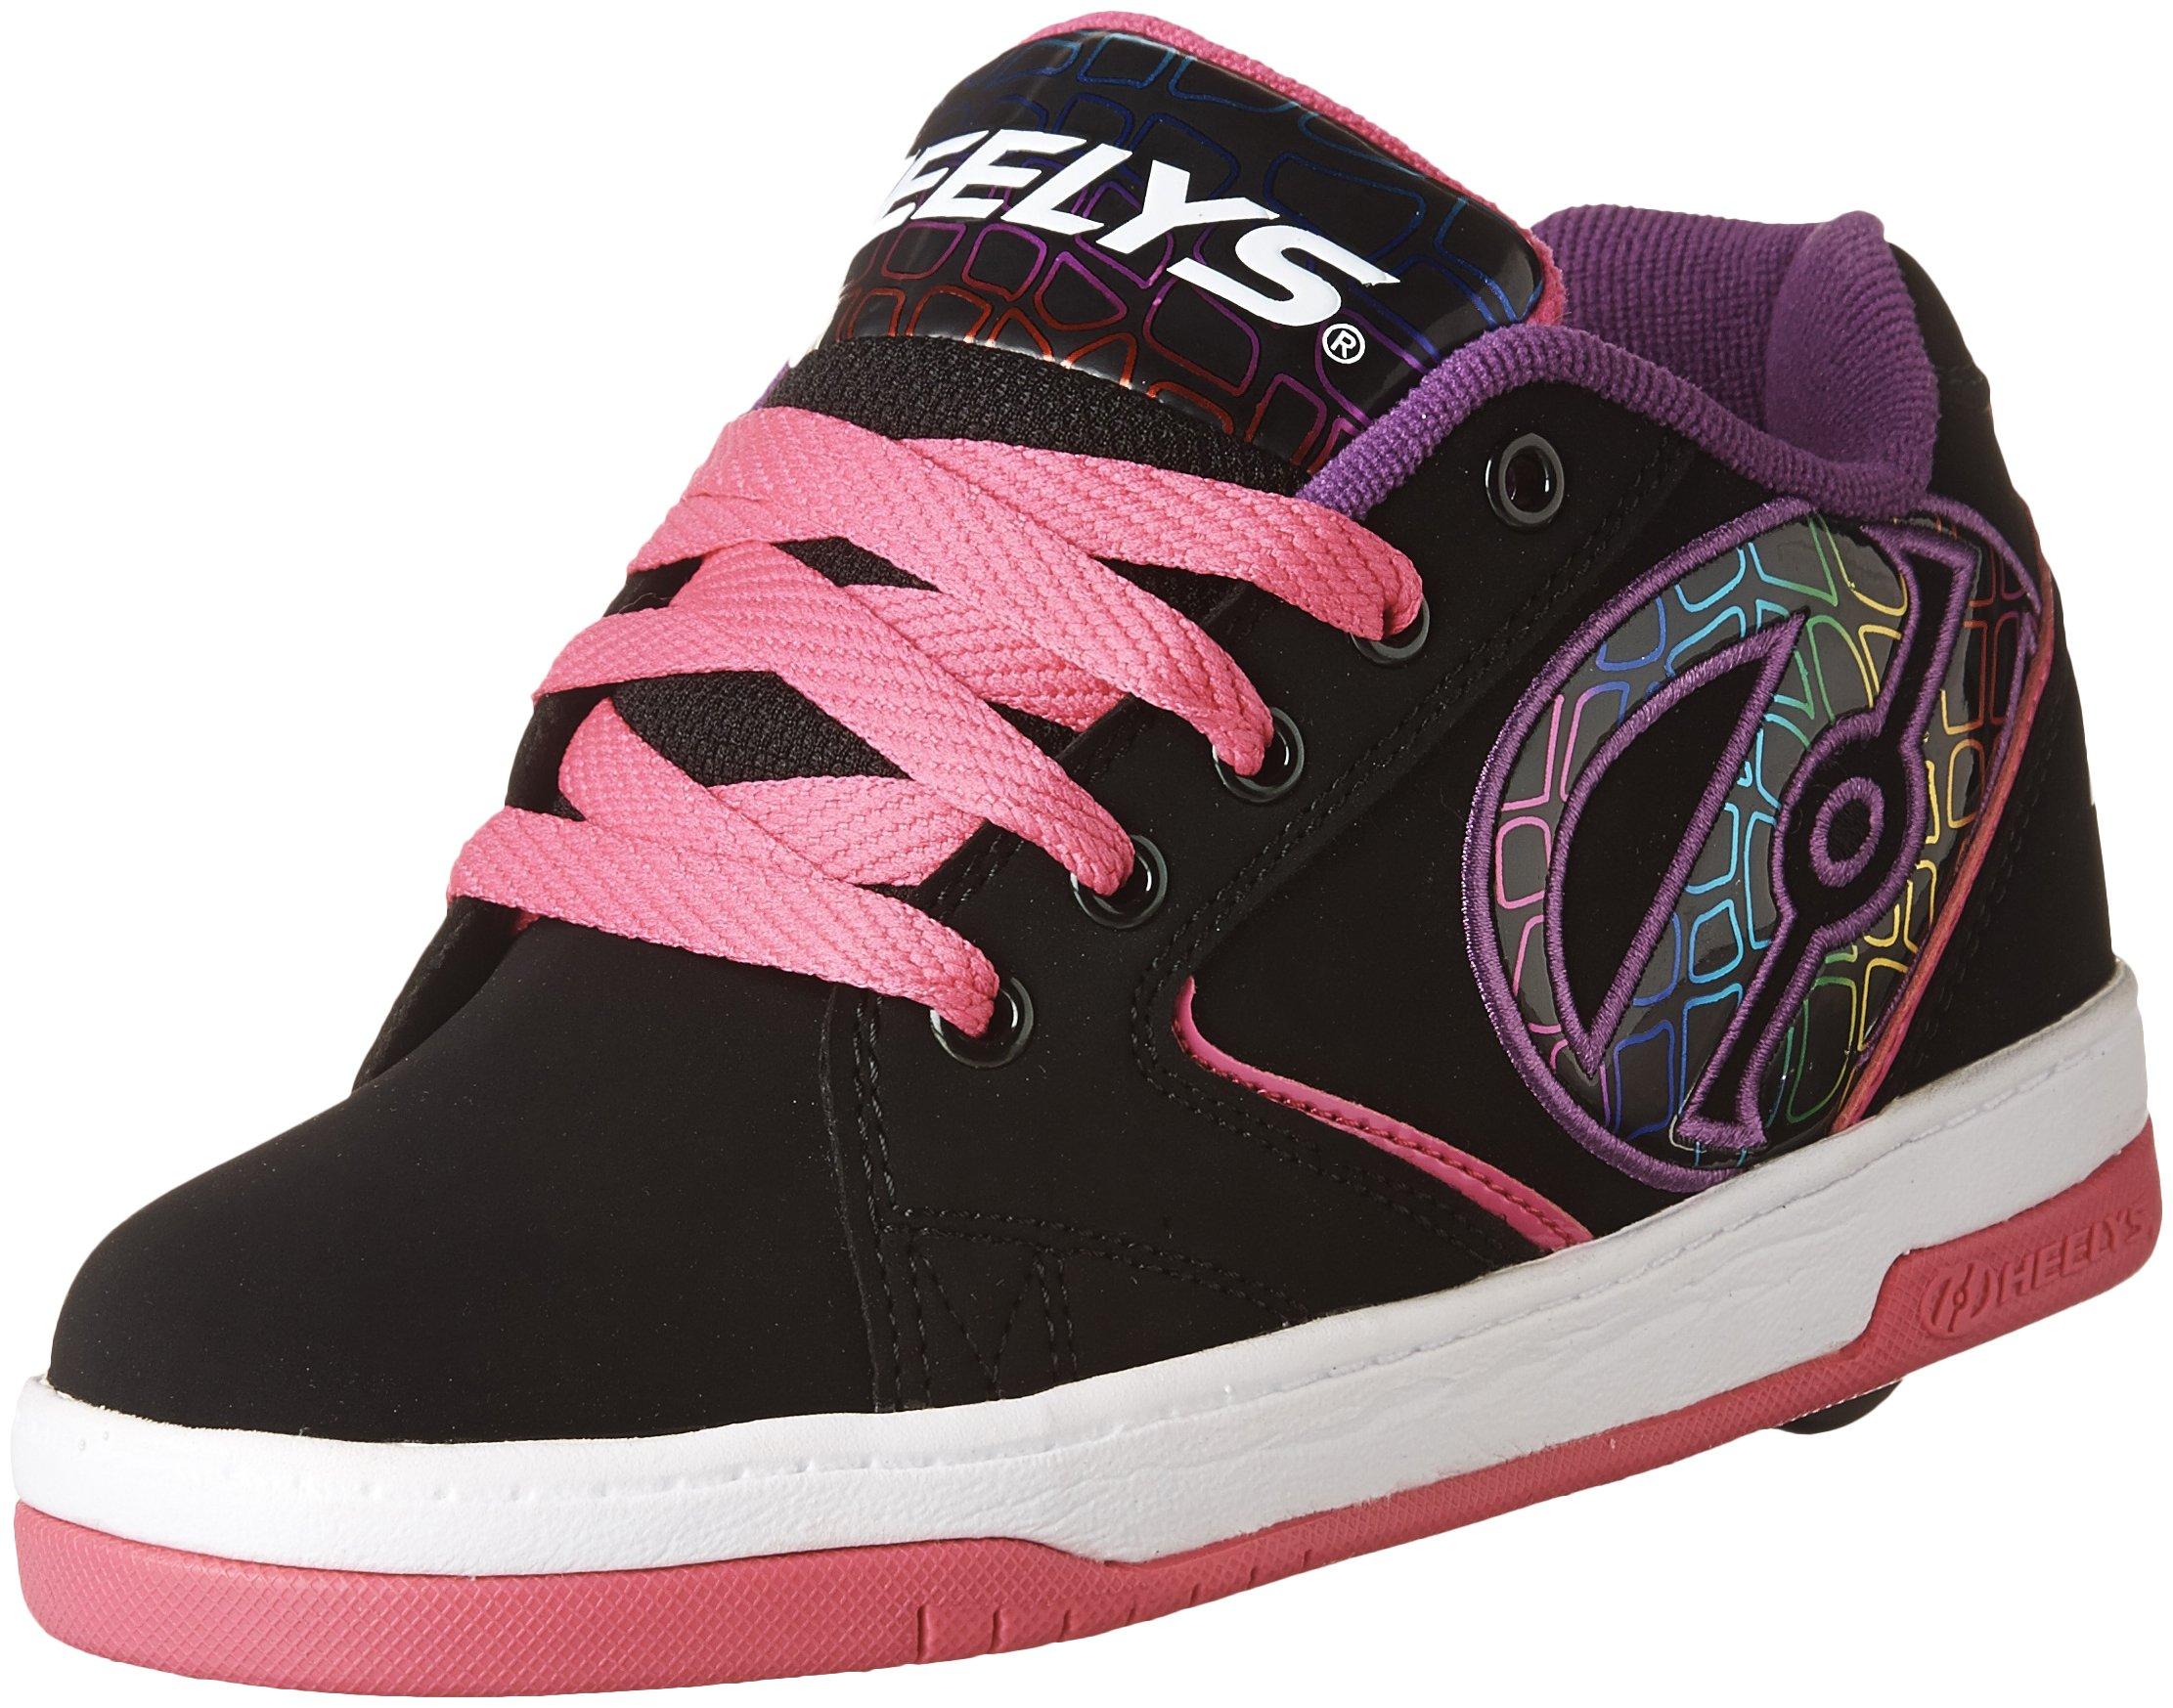 motion plus Trainer Unisex Child 770533 Heelys